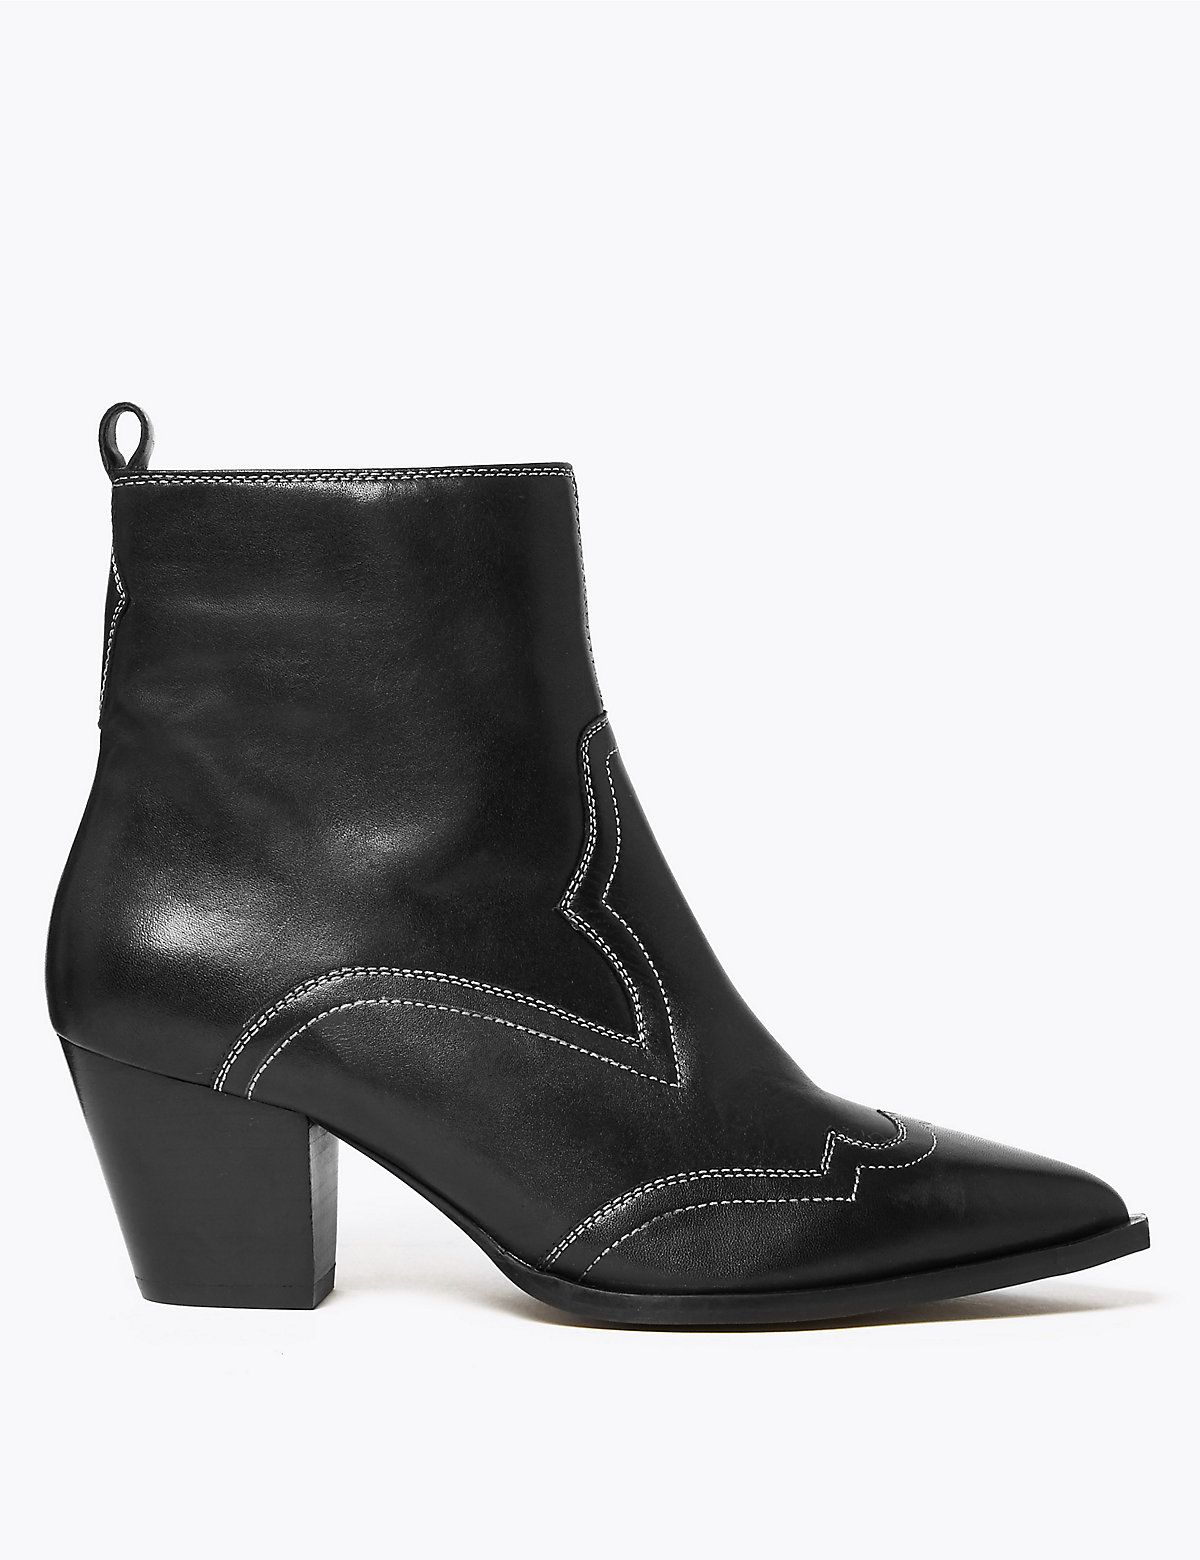 Best Marks \u0026 Spencer boots - M\u0026S boots